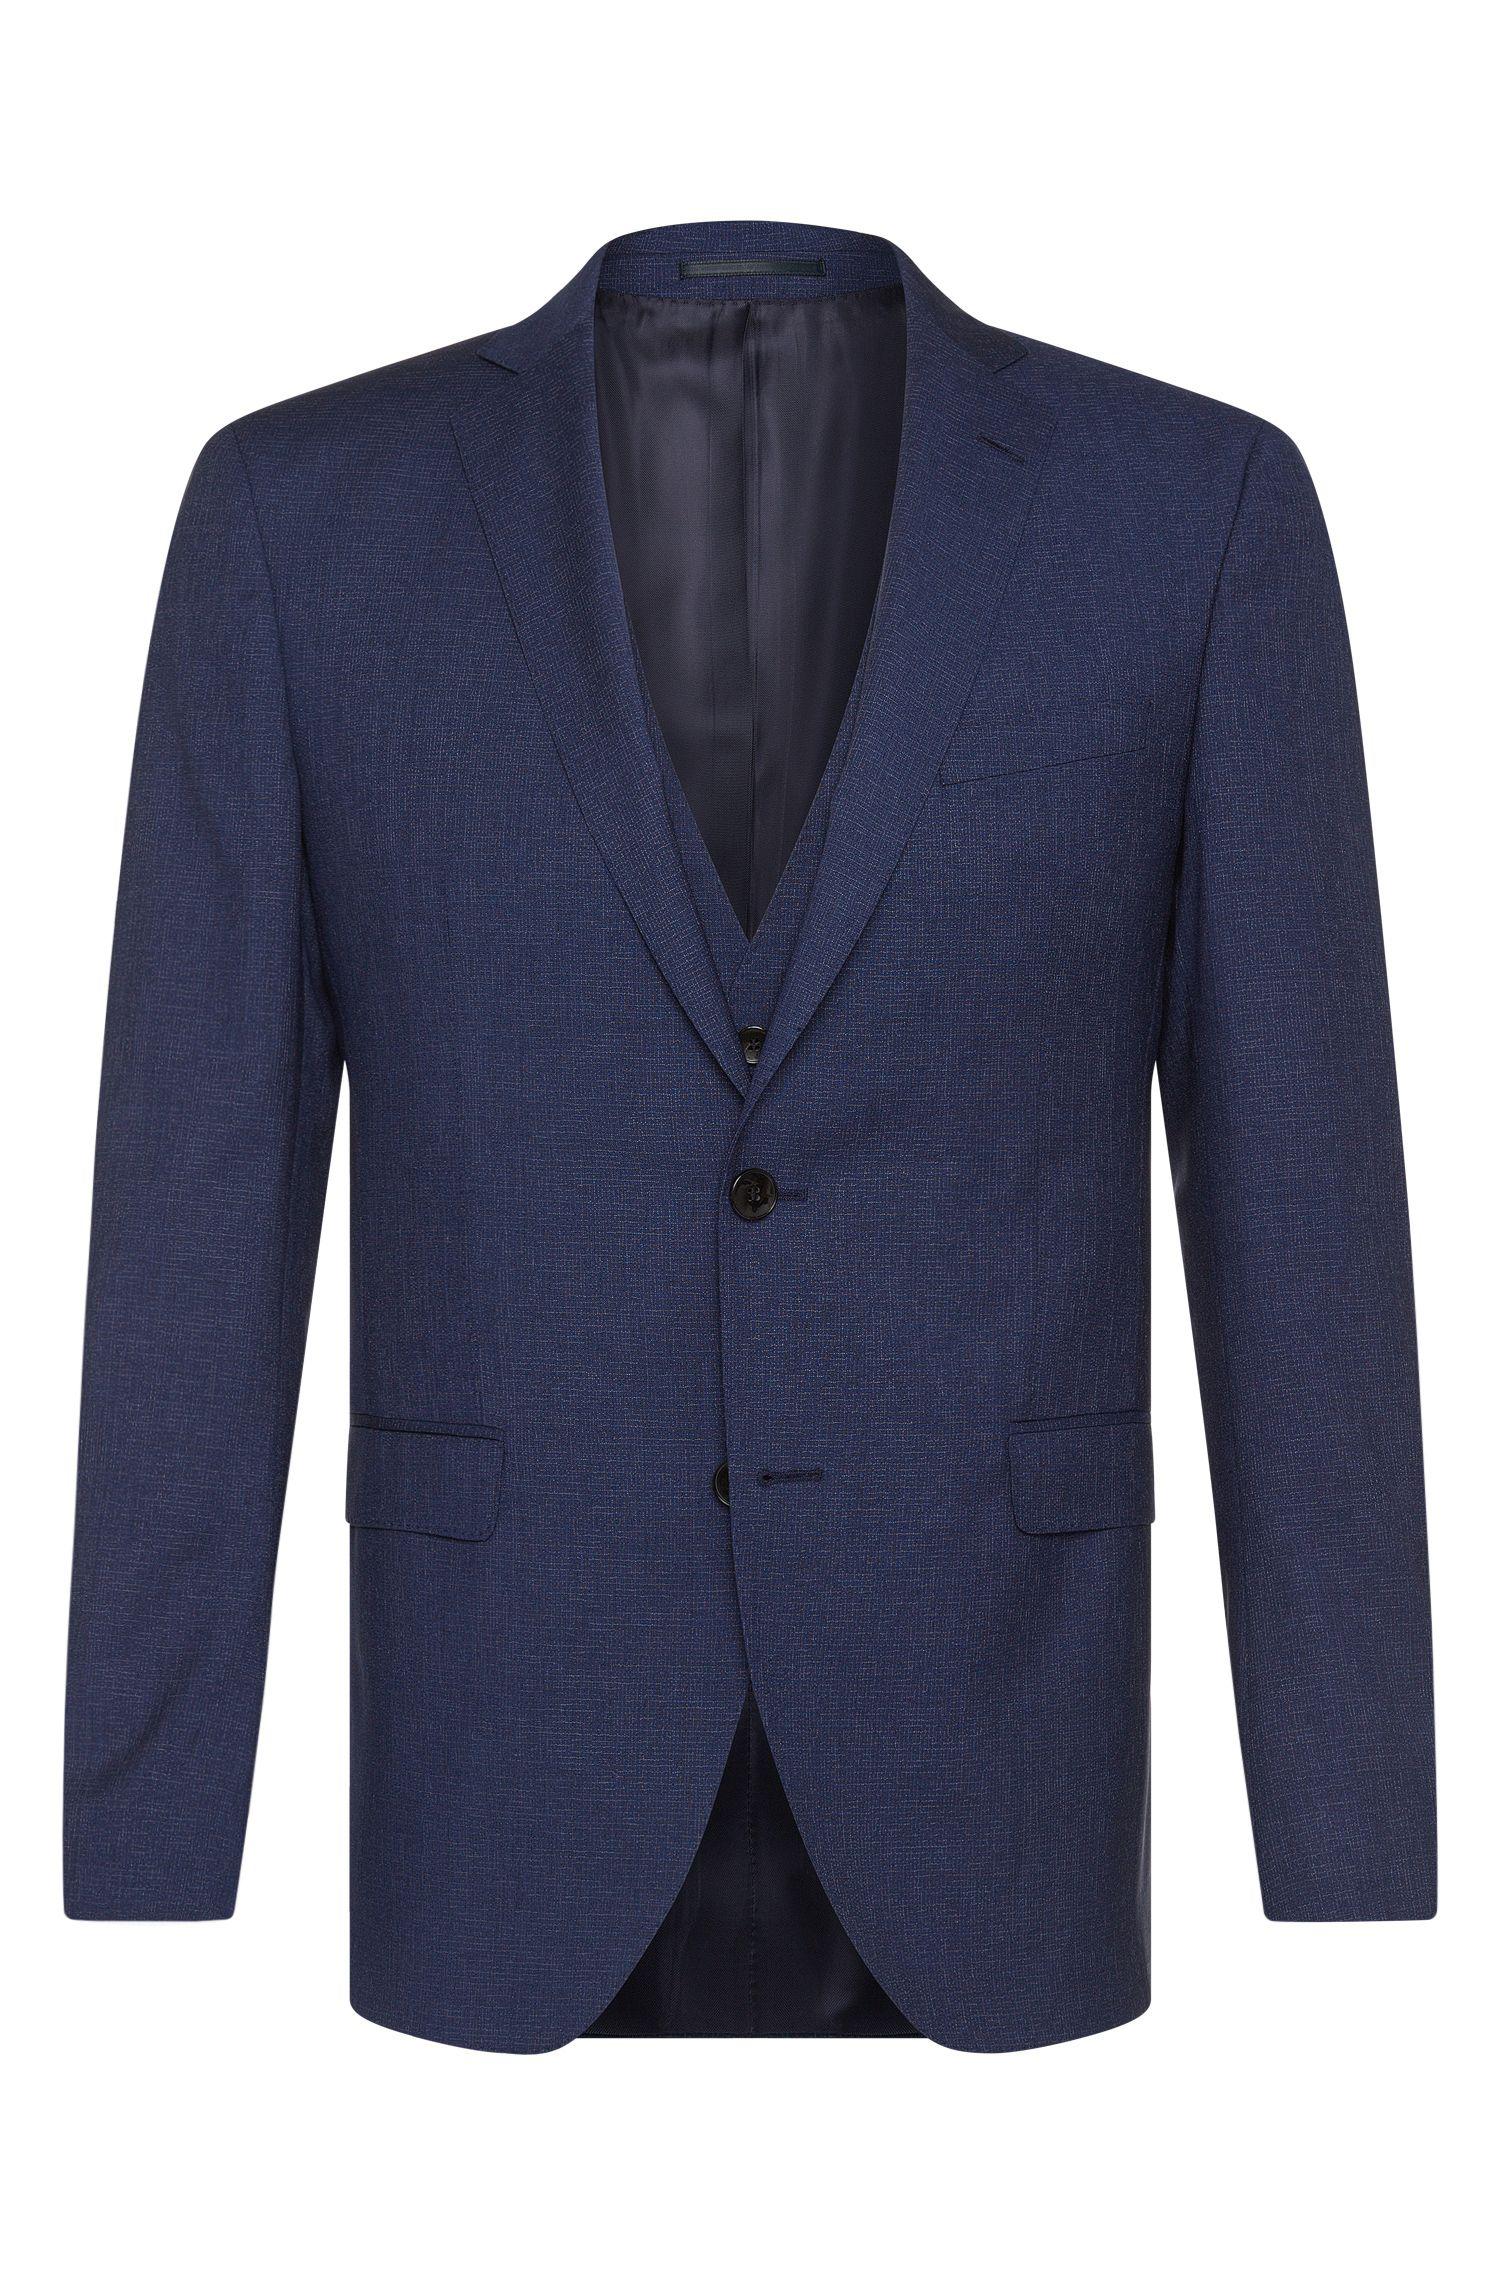 Wool-Silk 3-Piece Suit, Extra Slim Fit | Reyno/Wave WE, Blue